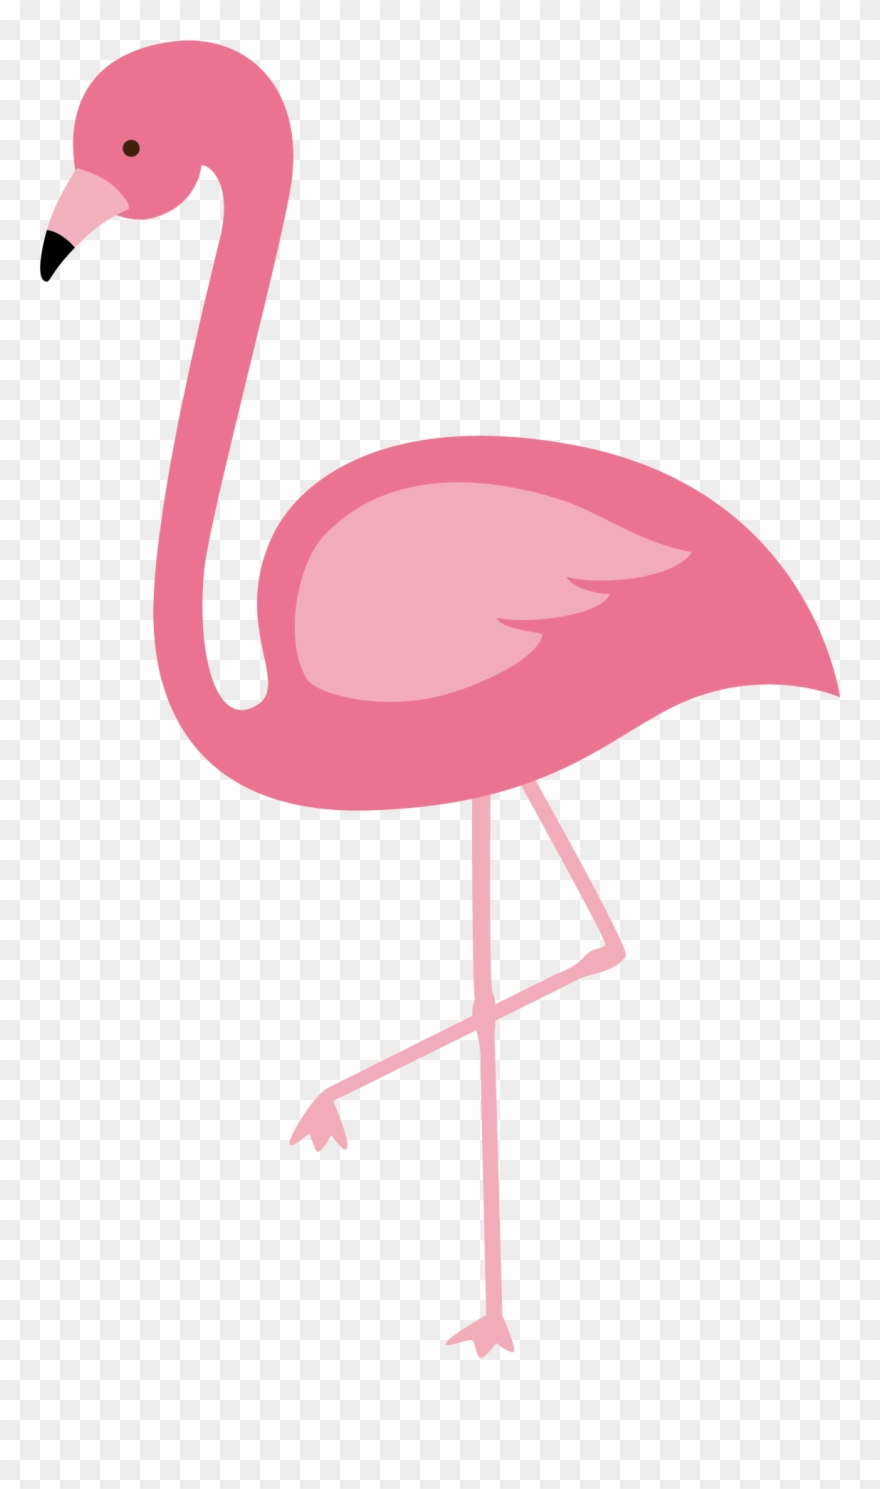 Flamingo Clipart Pink Flamingo.